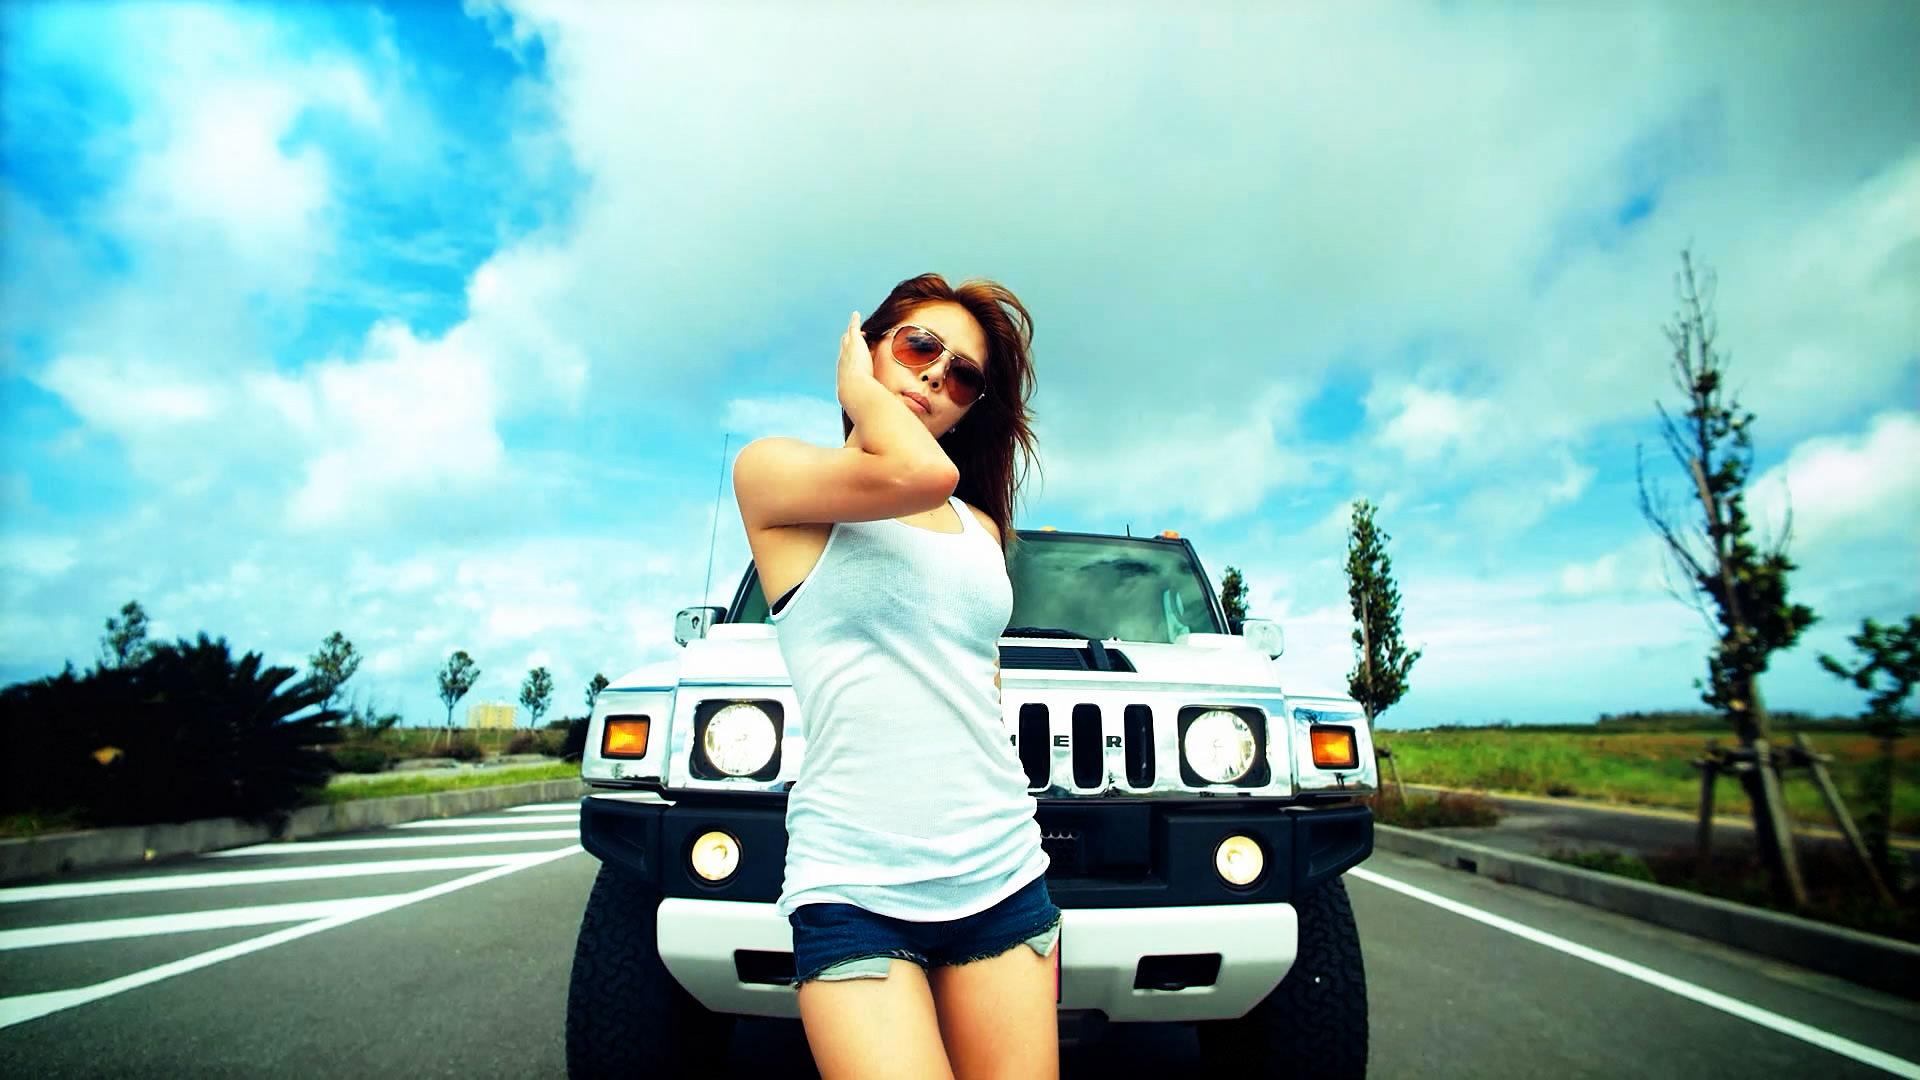 girls and cars wallpaper full hd 219260